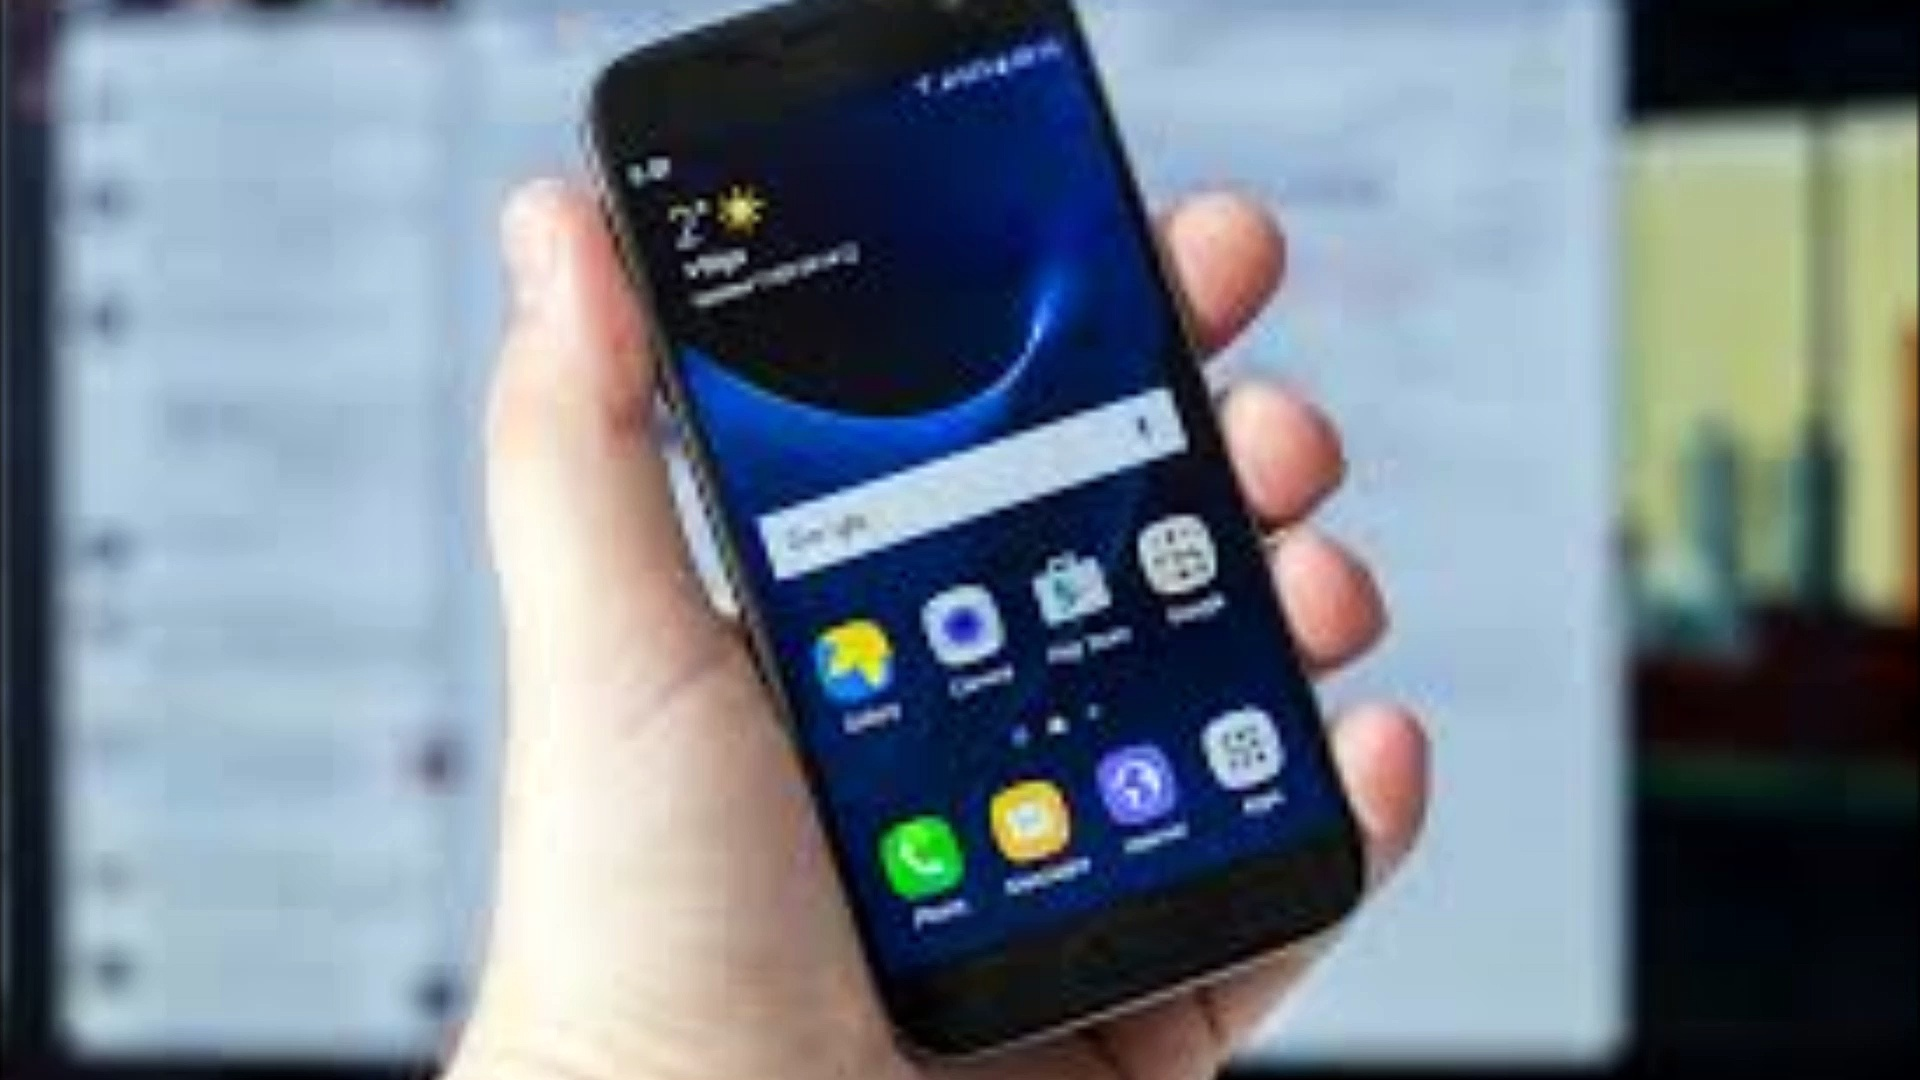 New Consumer Reports' Best smartphone